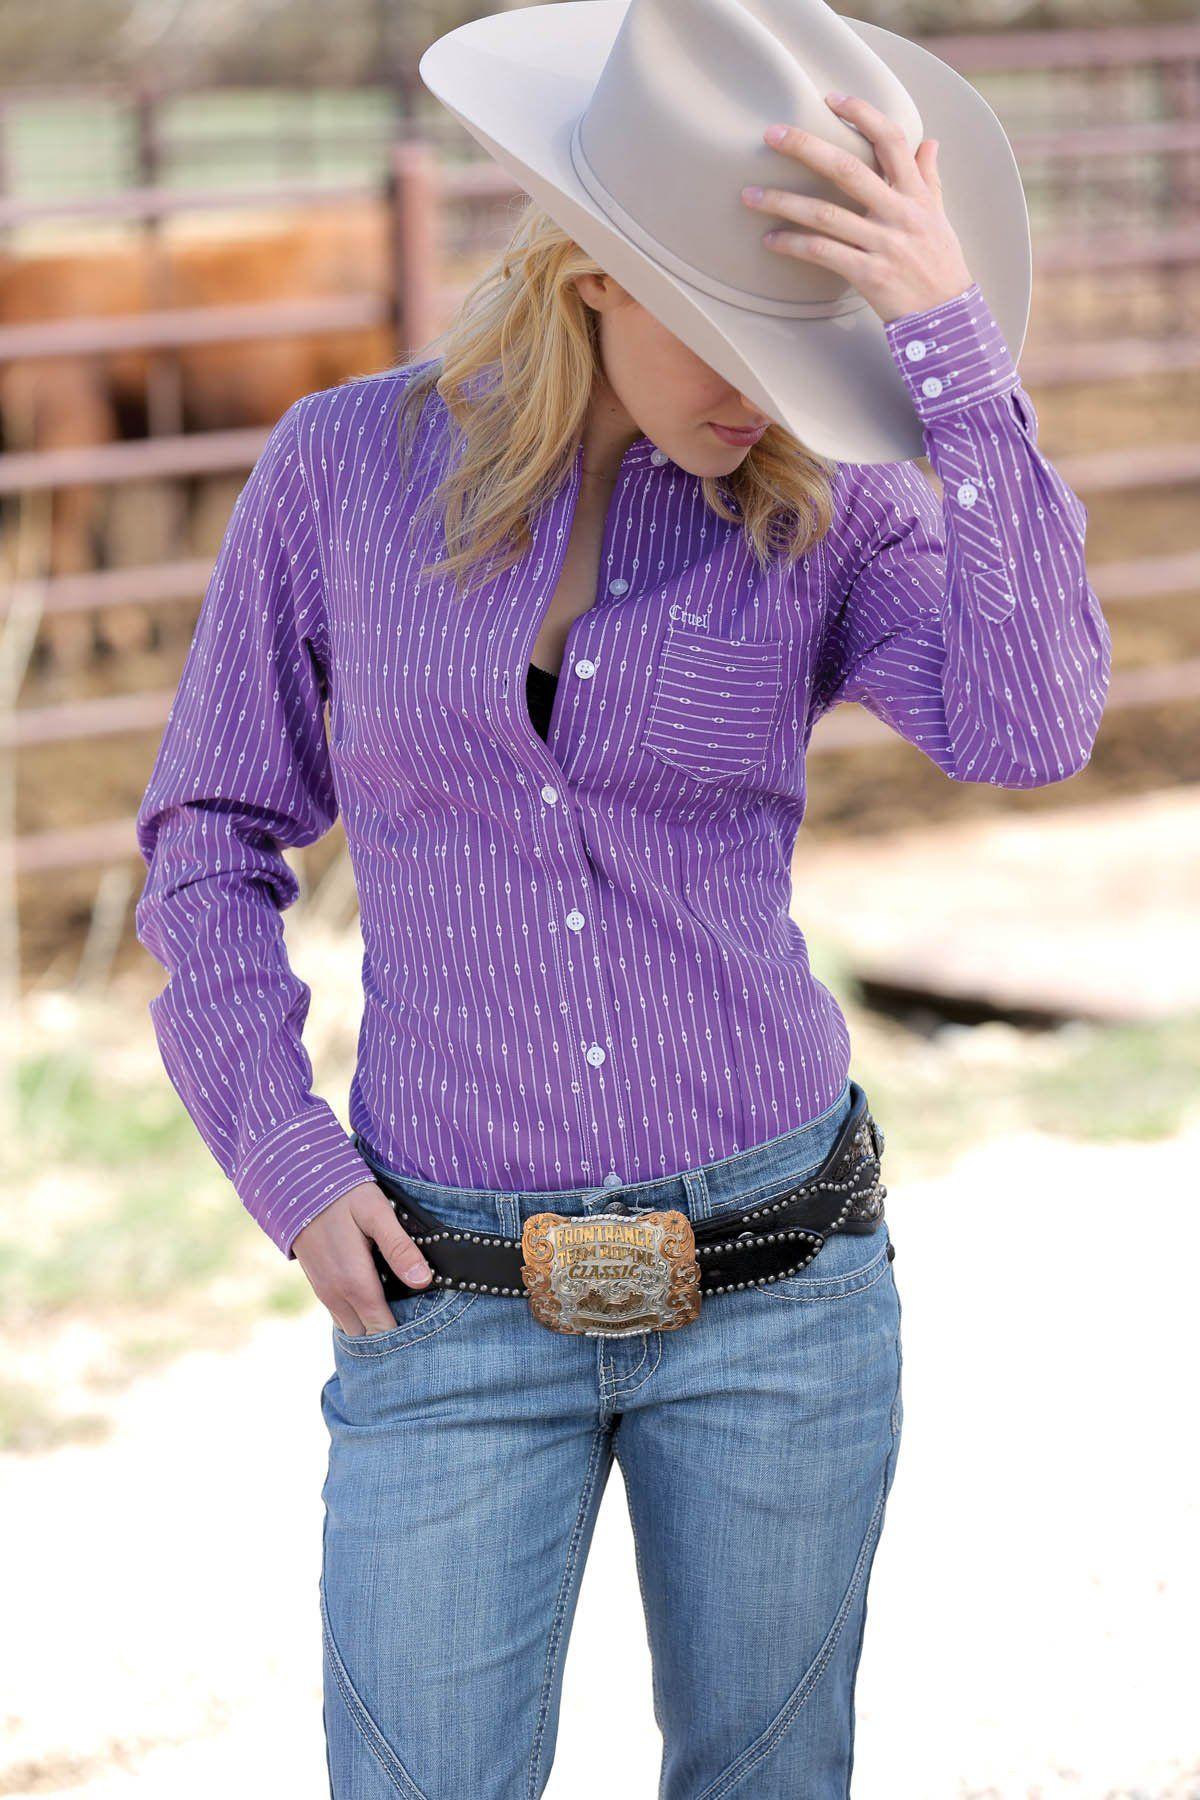 581486d50 Western Shirts : Purple Stripe Button Down Shirt - Cruel Girl ...